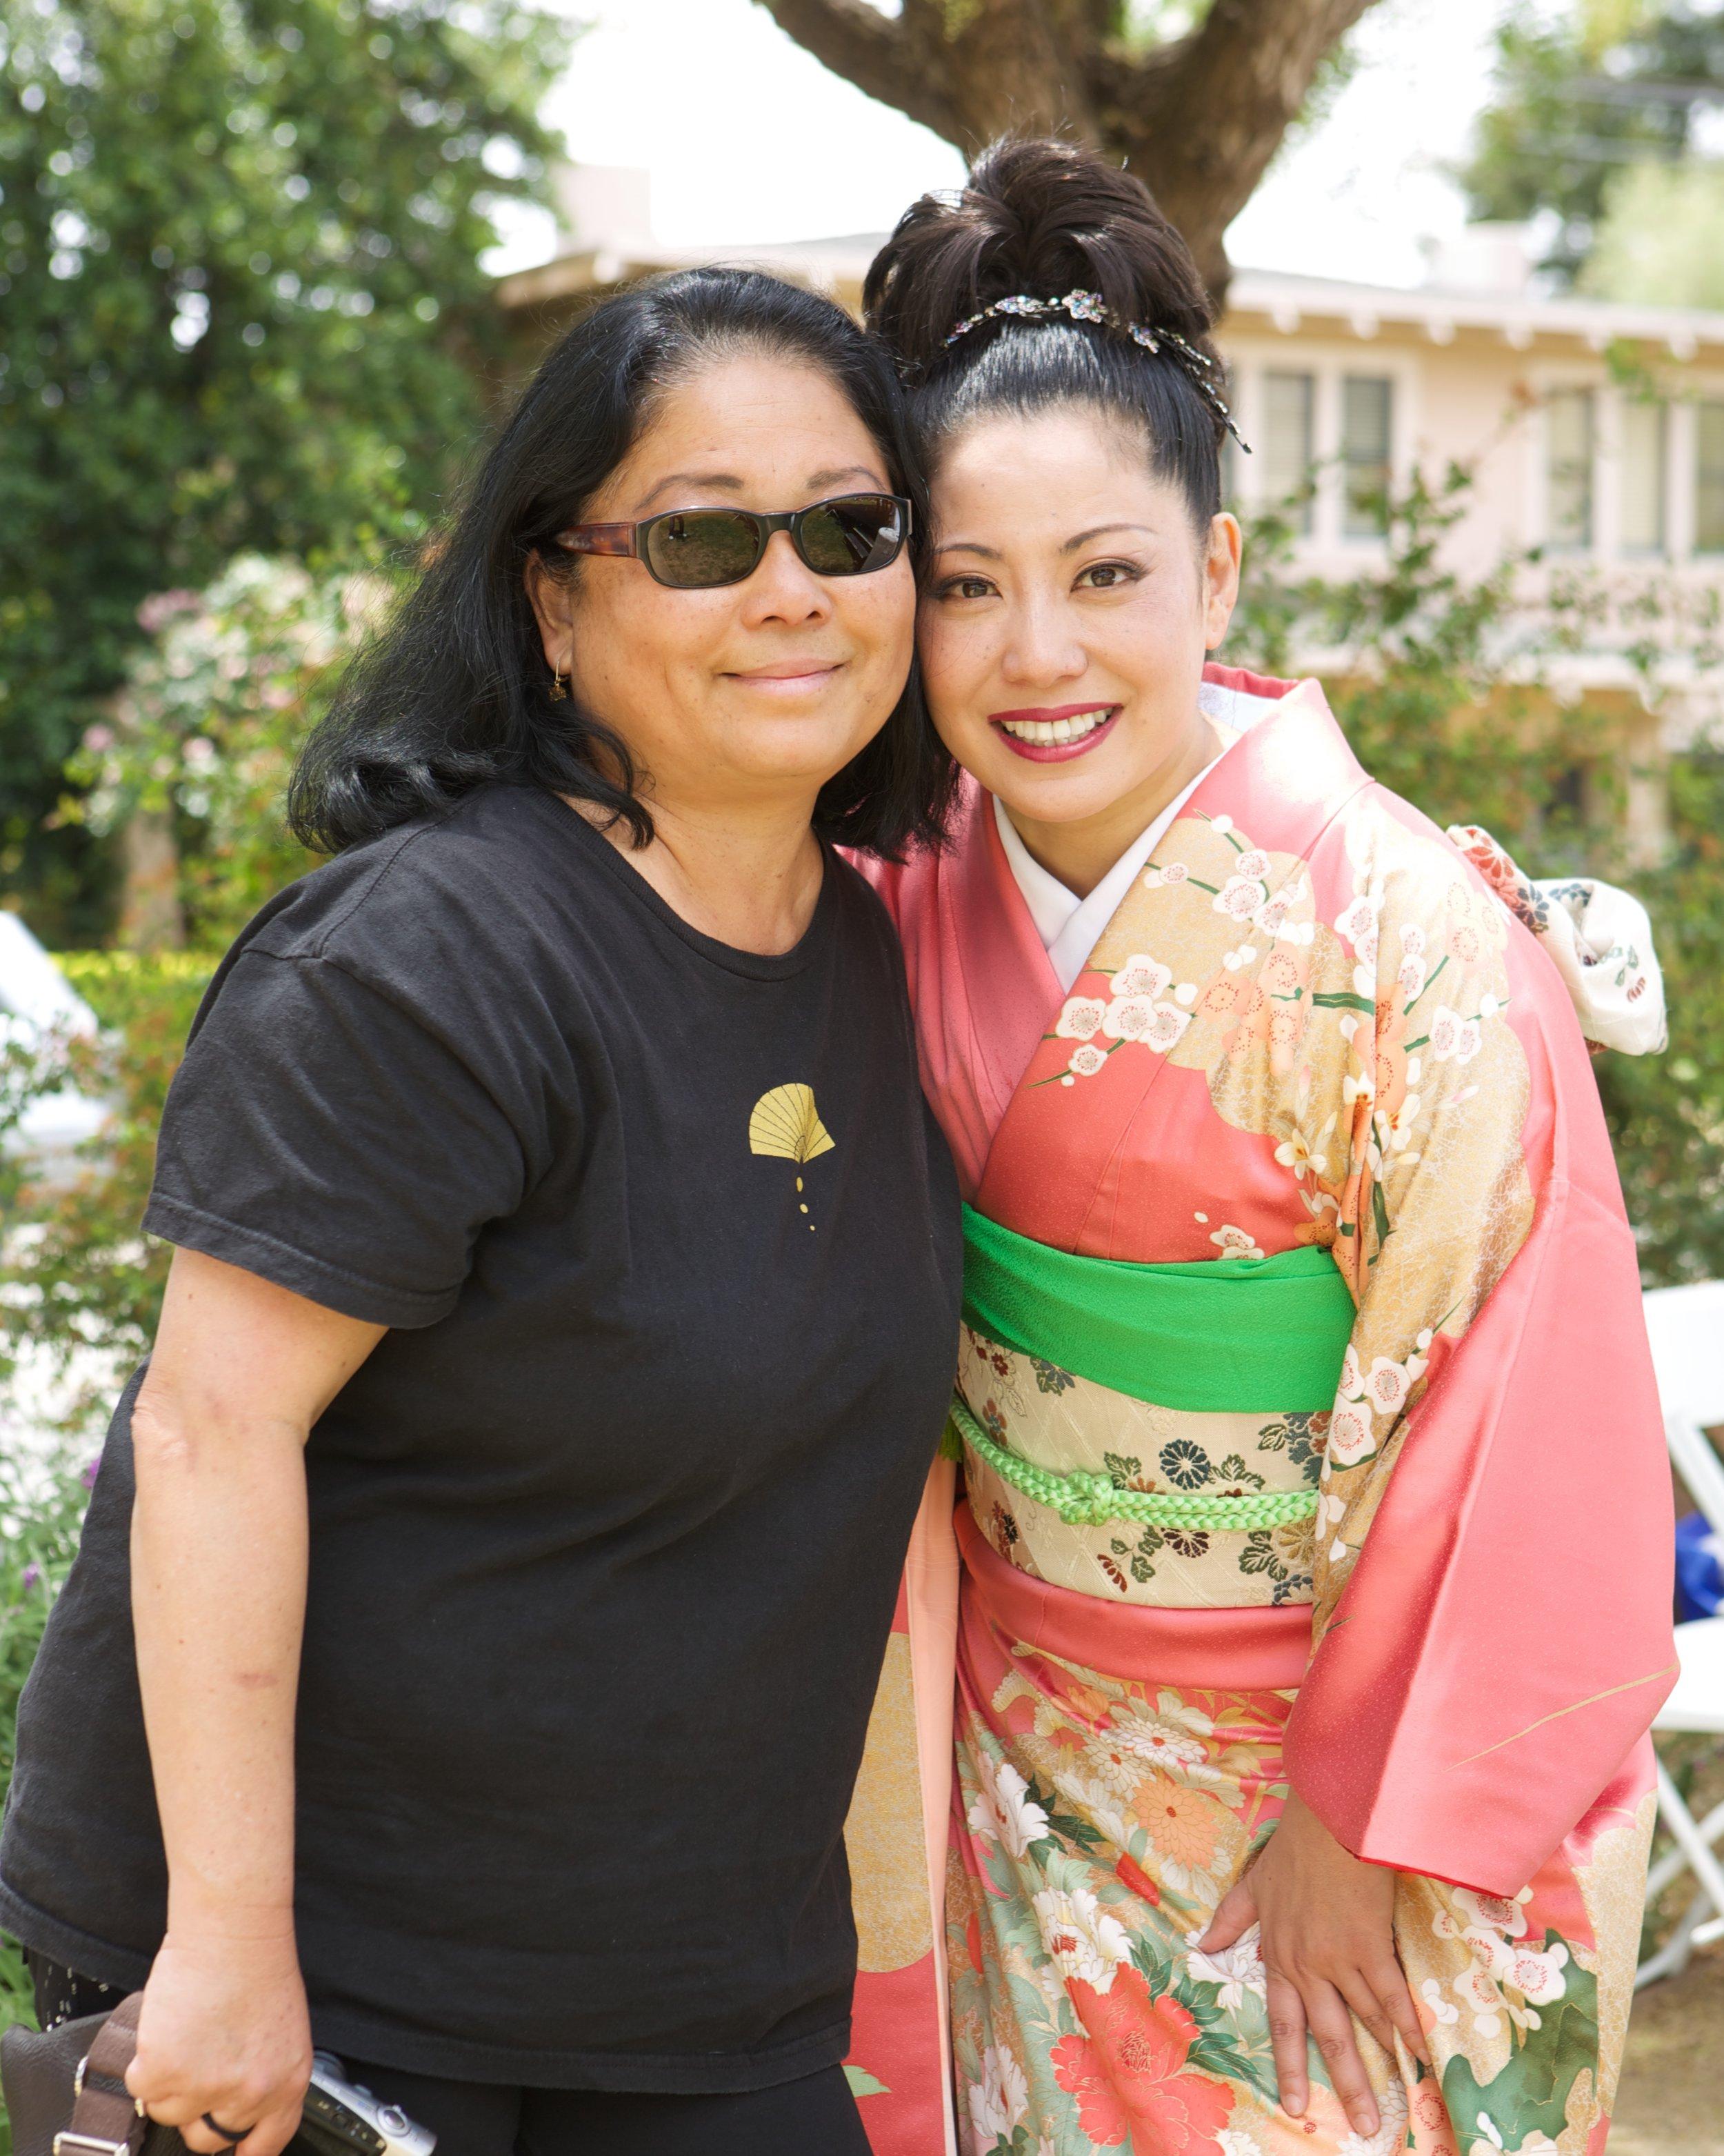 christine-and-lisa---japanese-cultural-fair-of-santa-cruz-2015_19589769622_o.jpg